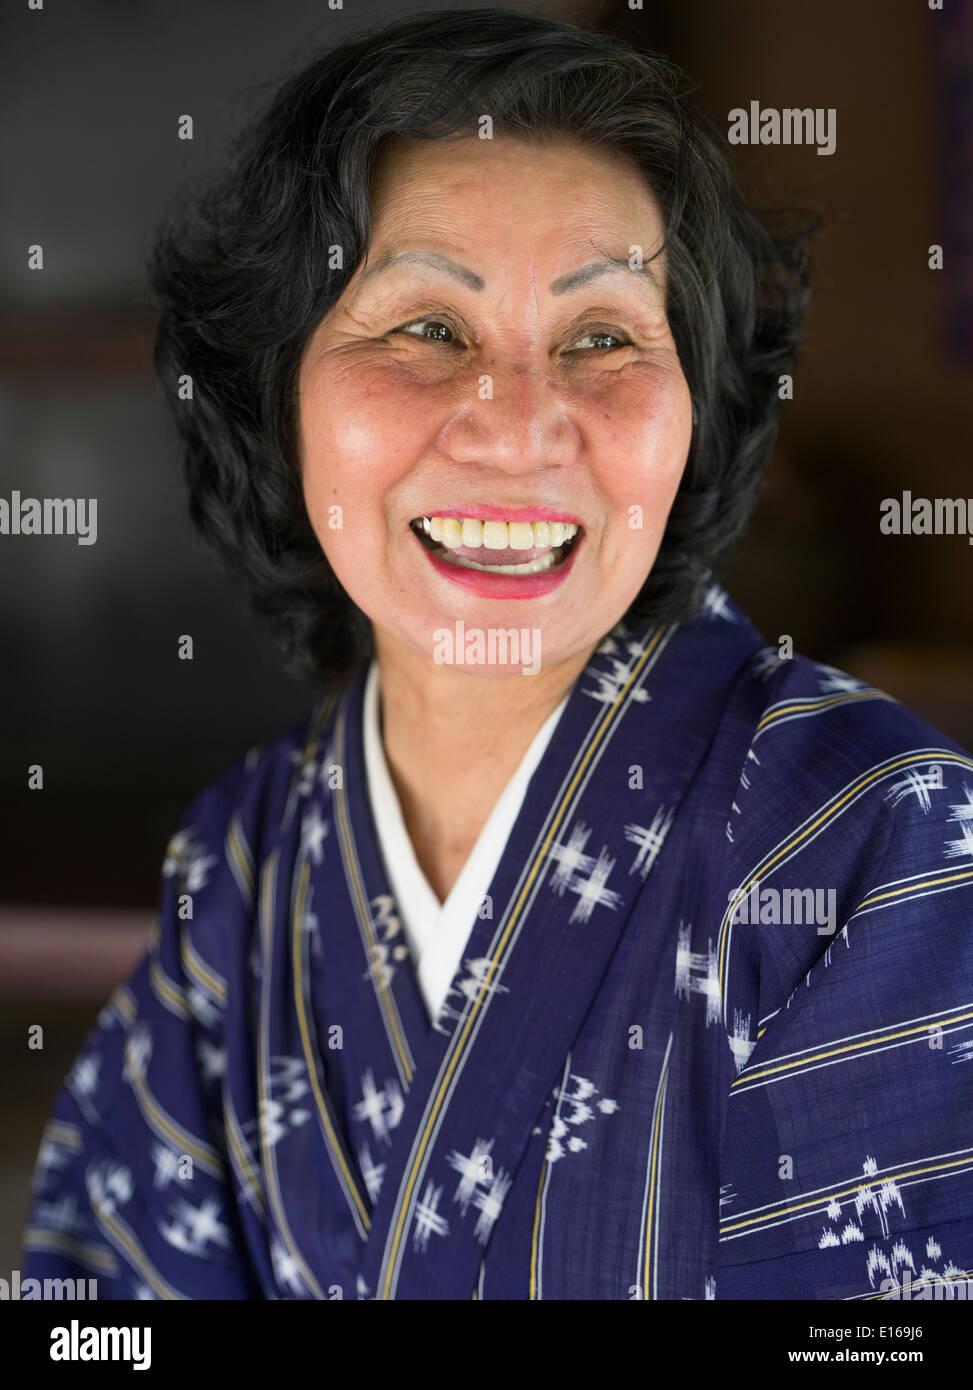 Personnes âgées belle femme portant yukuata Okinawan et souriant. Ryukyu Mura, Okinawa, Japon Photo Stock